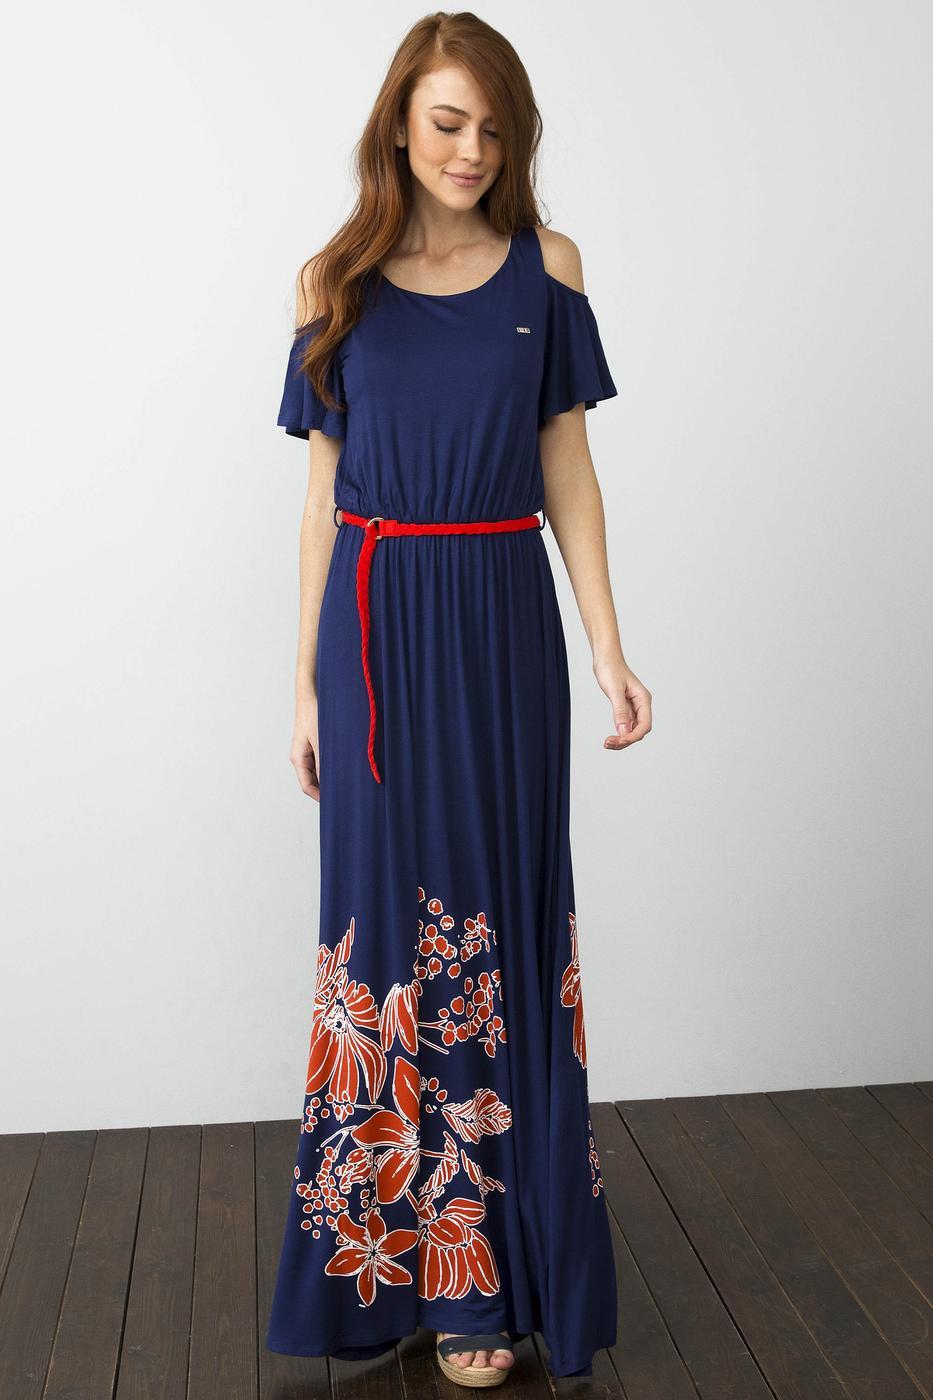 Lacivert Örme Elbise